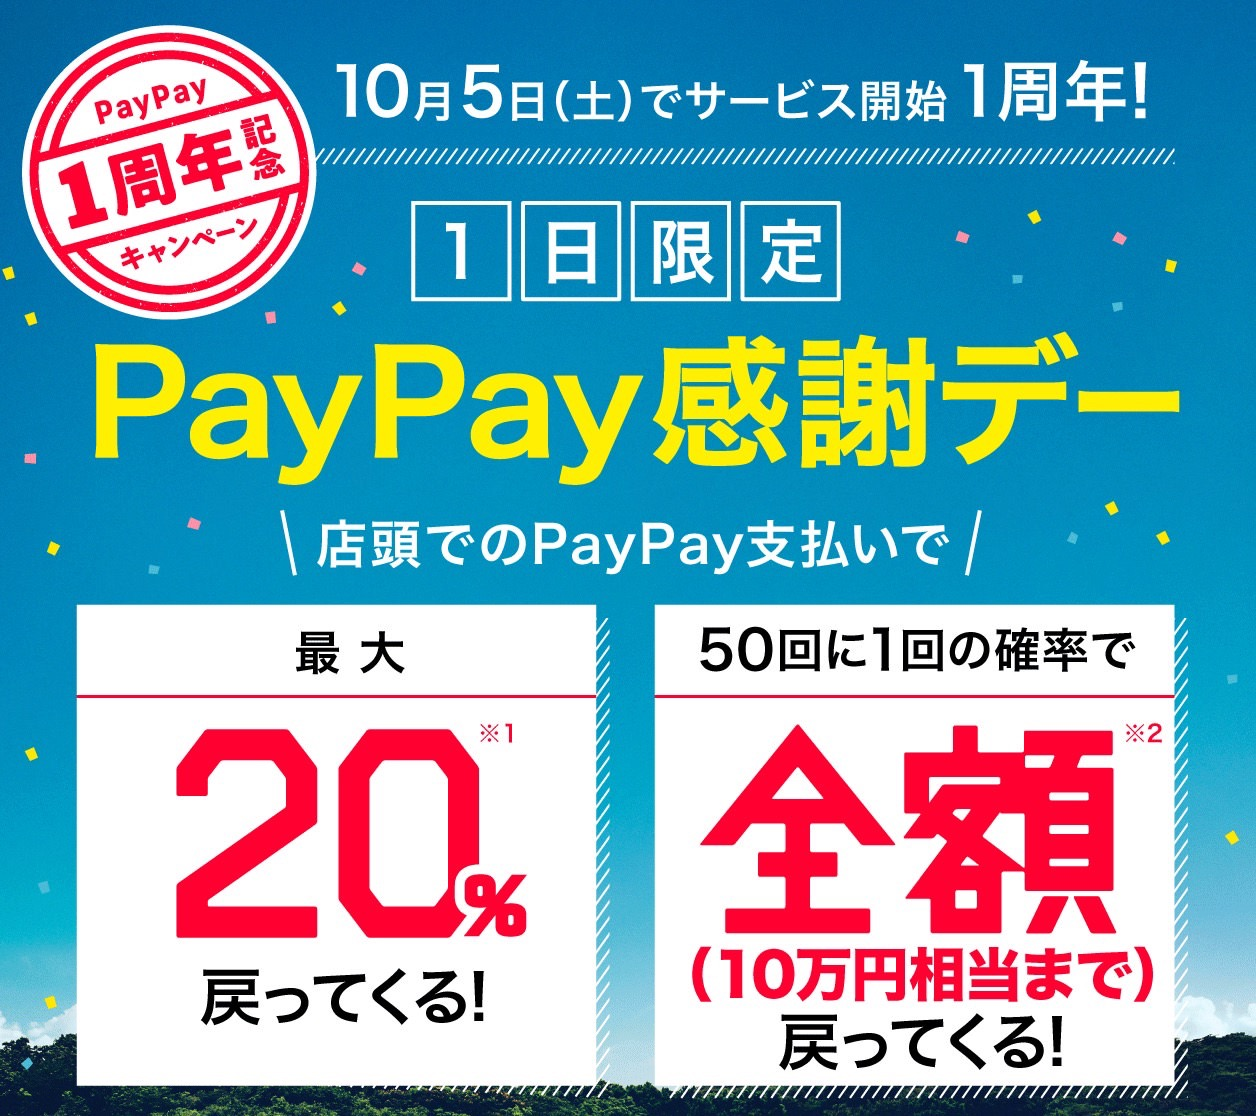 【PayPay】サービス1周年記念し20%還元「PayPay感謝デー」を10/5に1日限定で開催